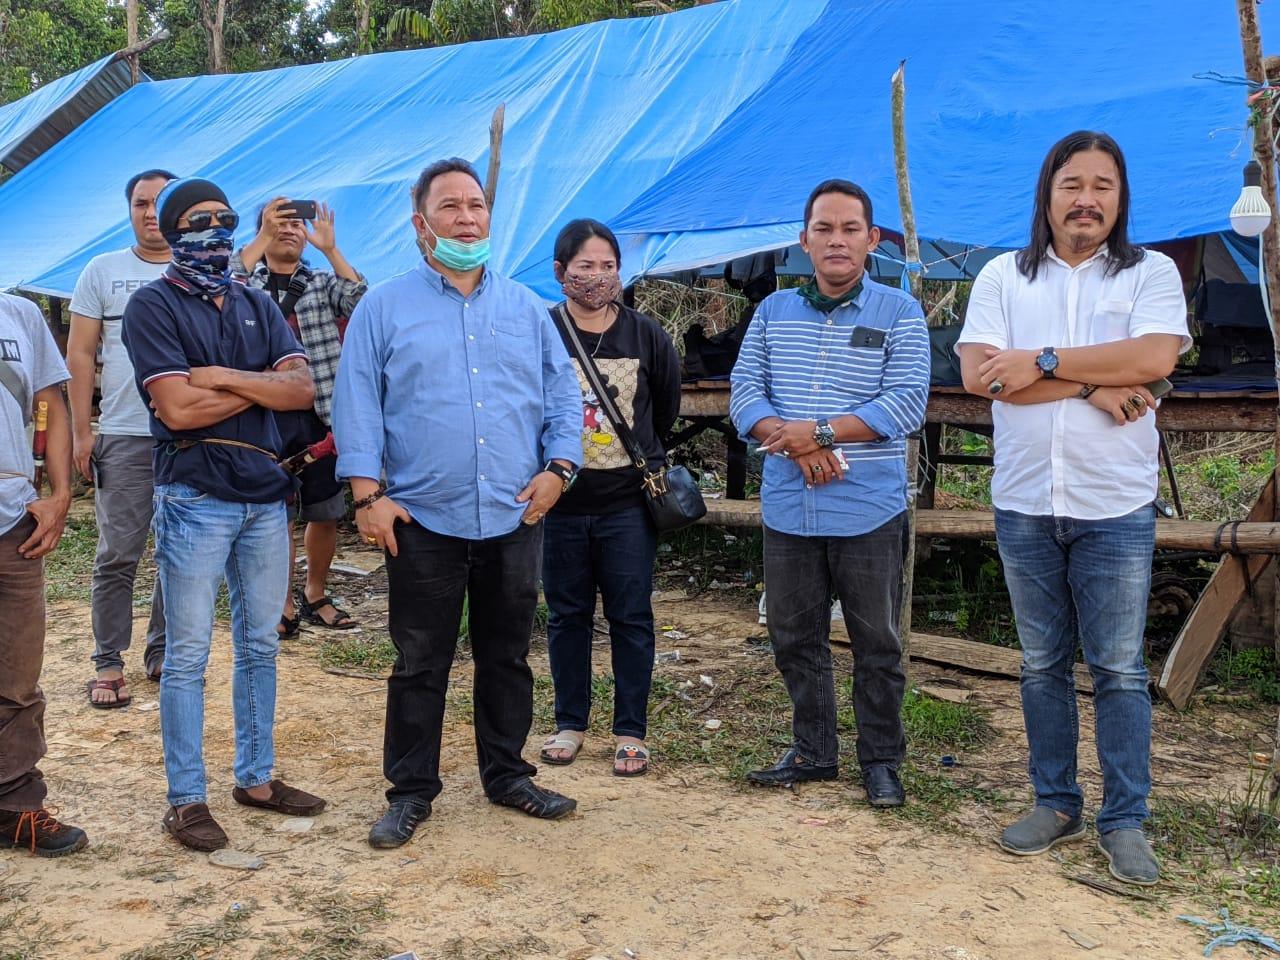 DPRD Mura mendorong pemerintah untuk Tingkatkan Sektor Pertanian